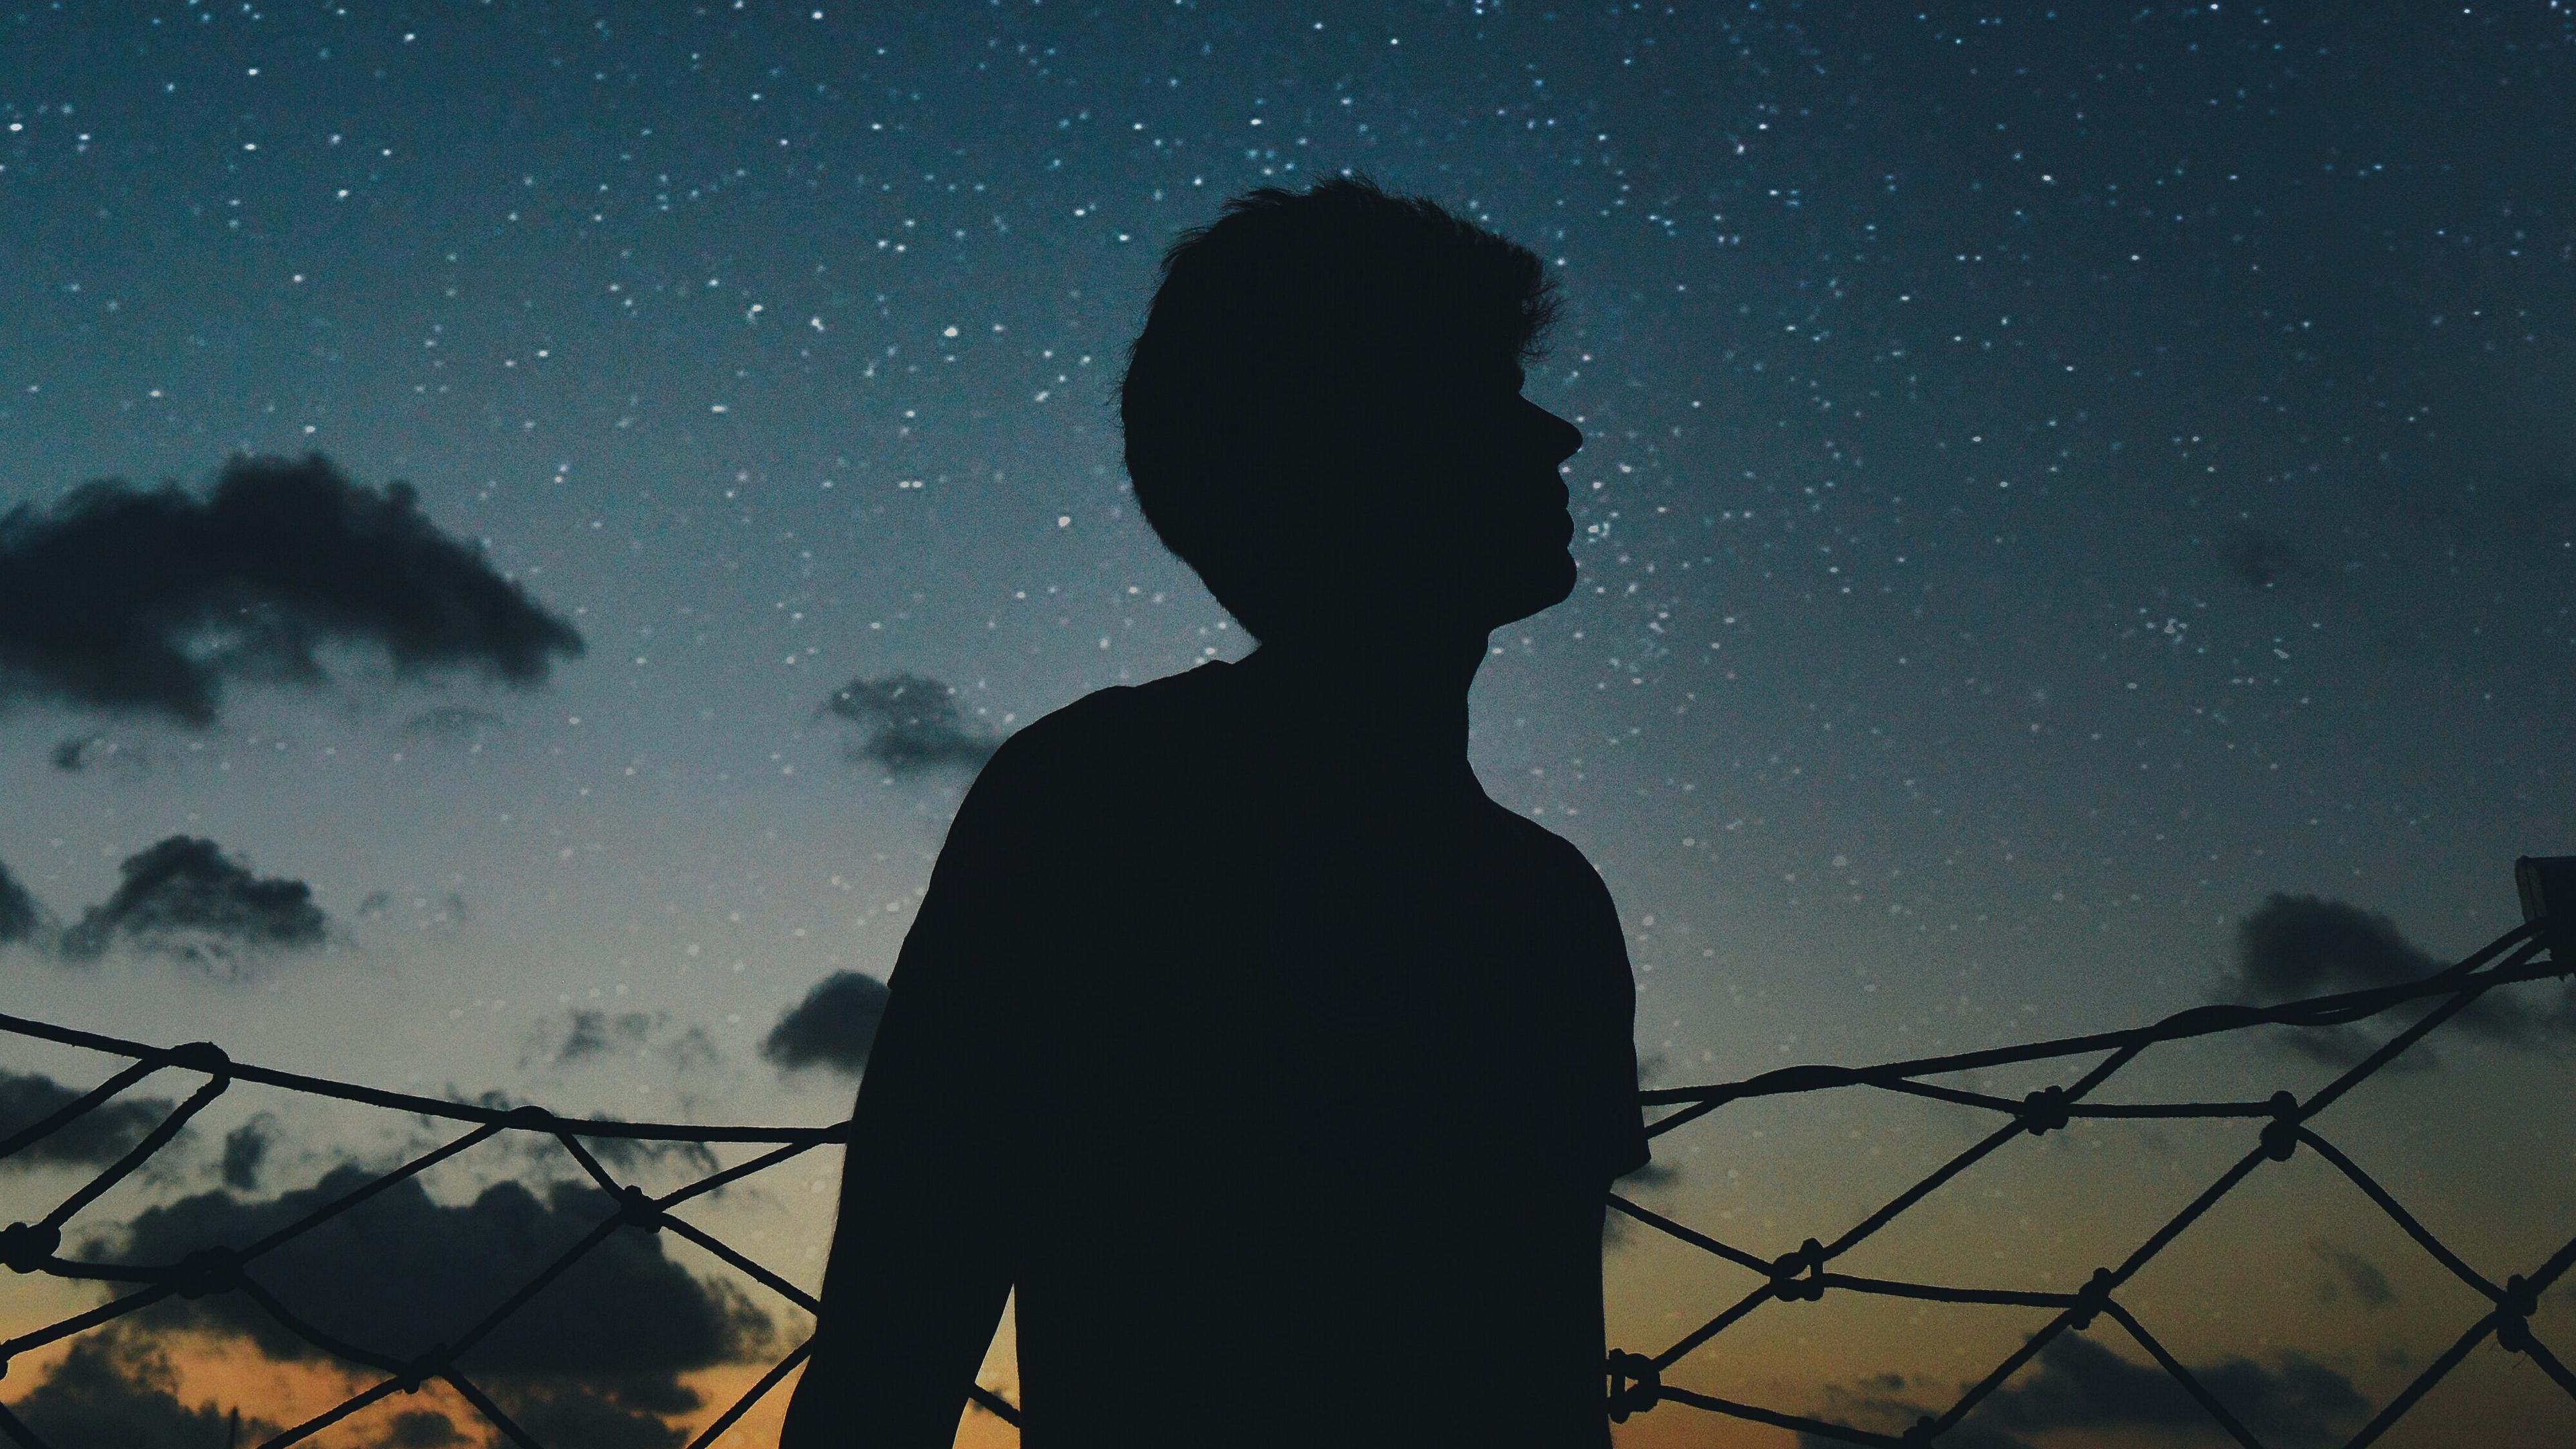 starry sky silhouette loneliness 4k 1540575919 - starry sky, silhouette, loneliness 4k - starry sky, Silhouette, loneliness